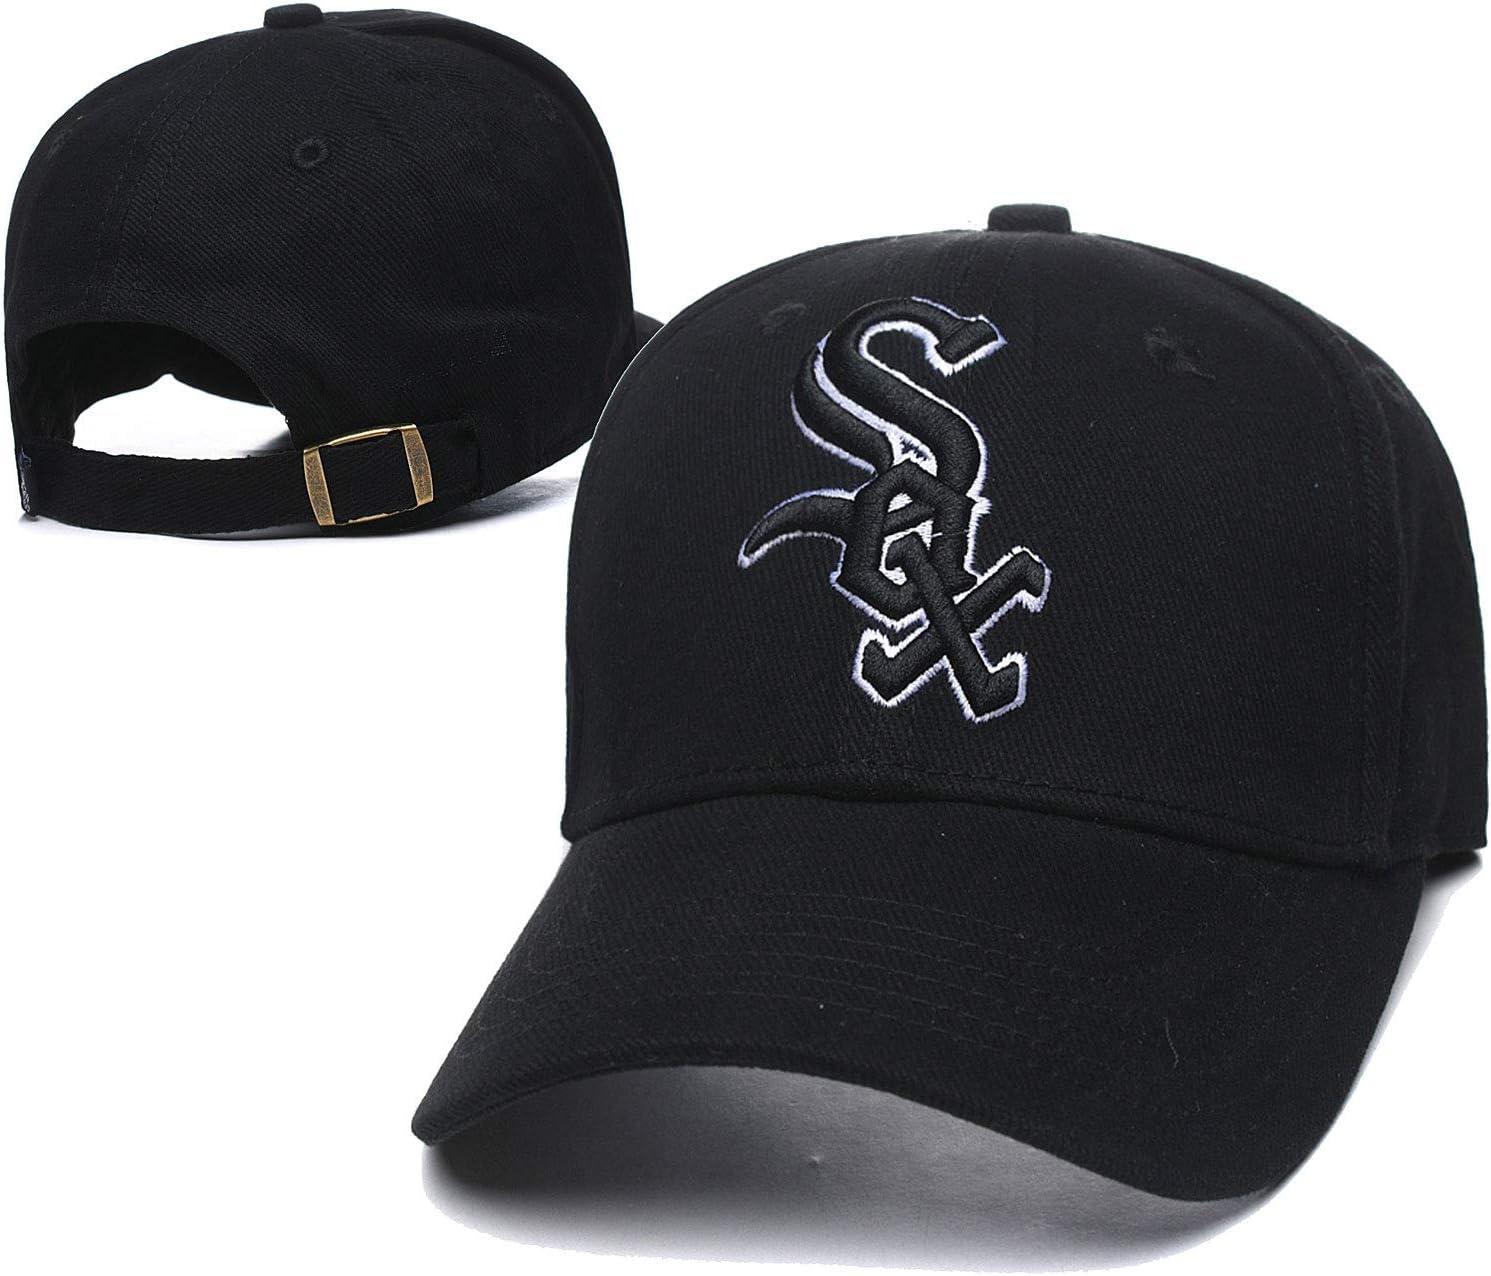 Adjustable All-Star Baseball Hat Dokdin Adult Men /& Women Baseball Cap